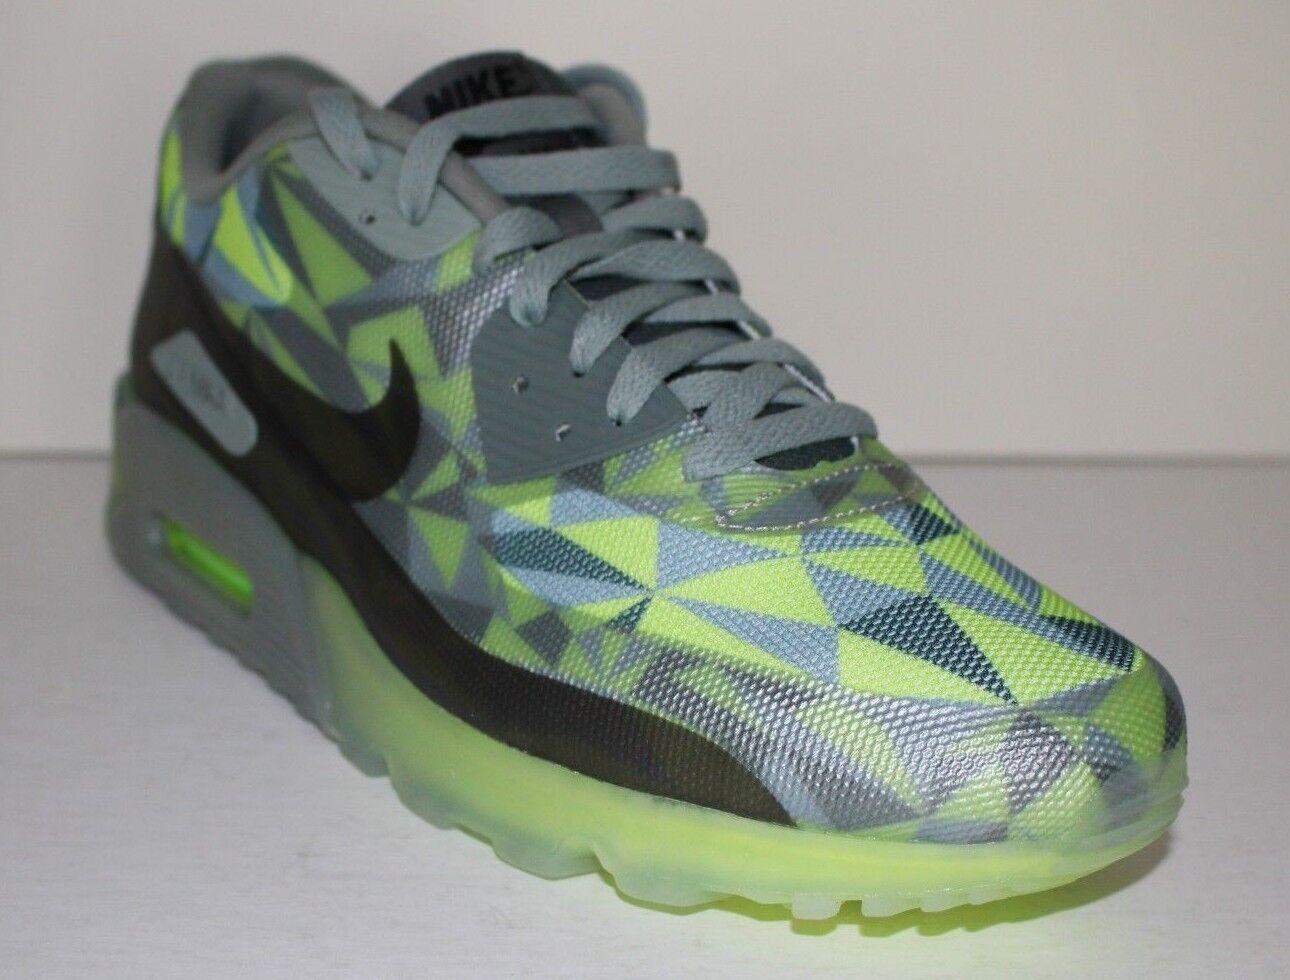 Nike Air Max 90 Ice Pack Mens Mens Mens Running shoes Volt